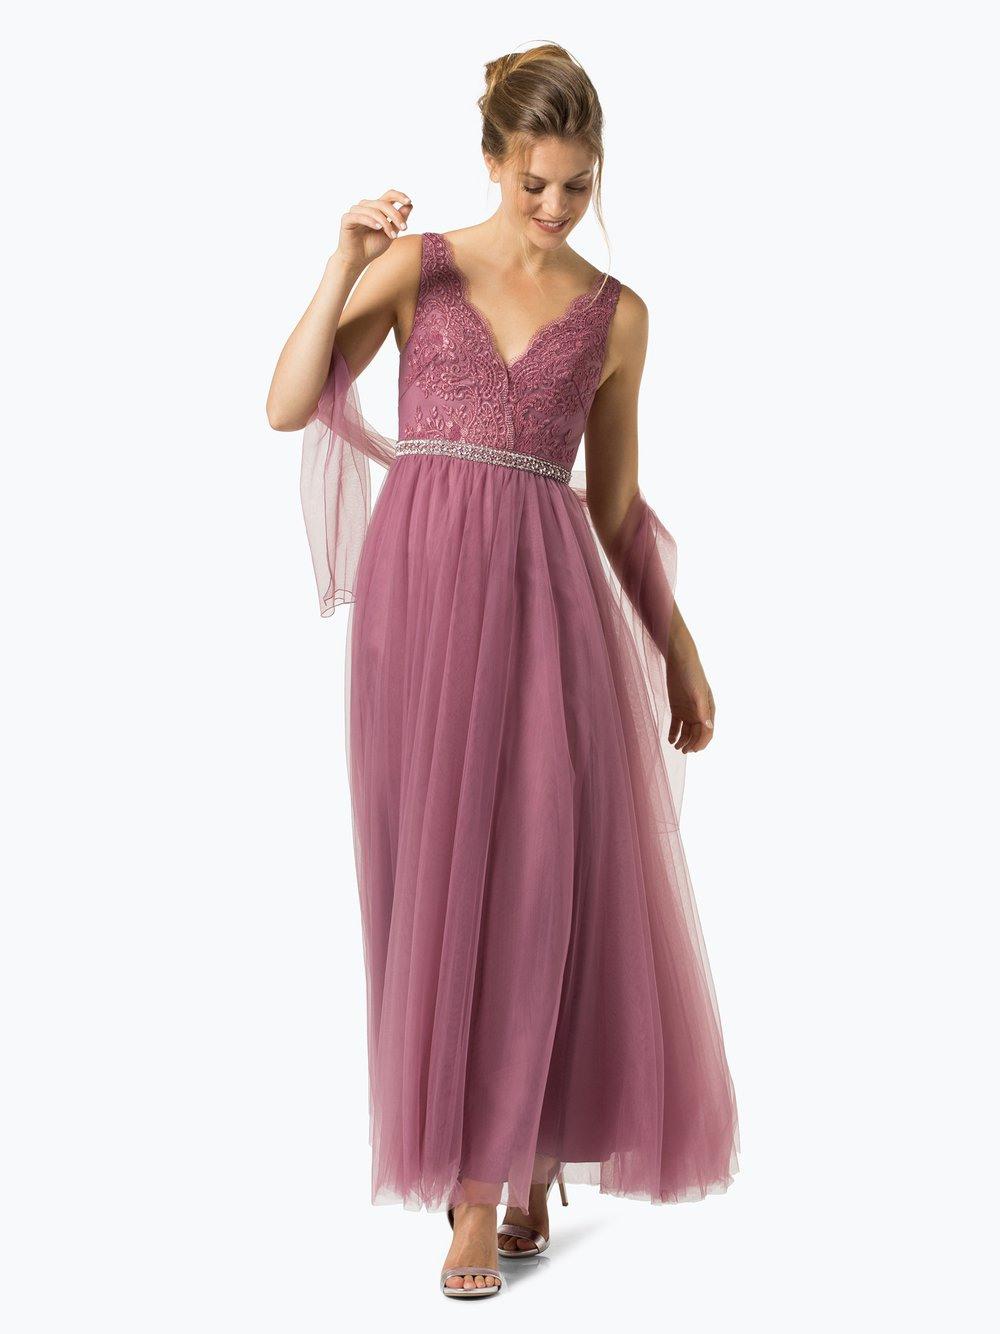 Formal Luxurius Unique Abendkleid Rosa Bester Preis20 Perfekt Unique Abendkleid Rosa Design